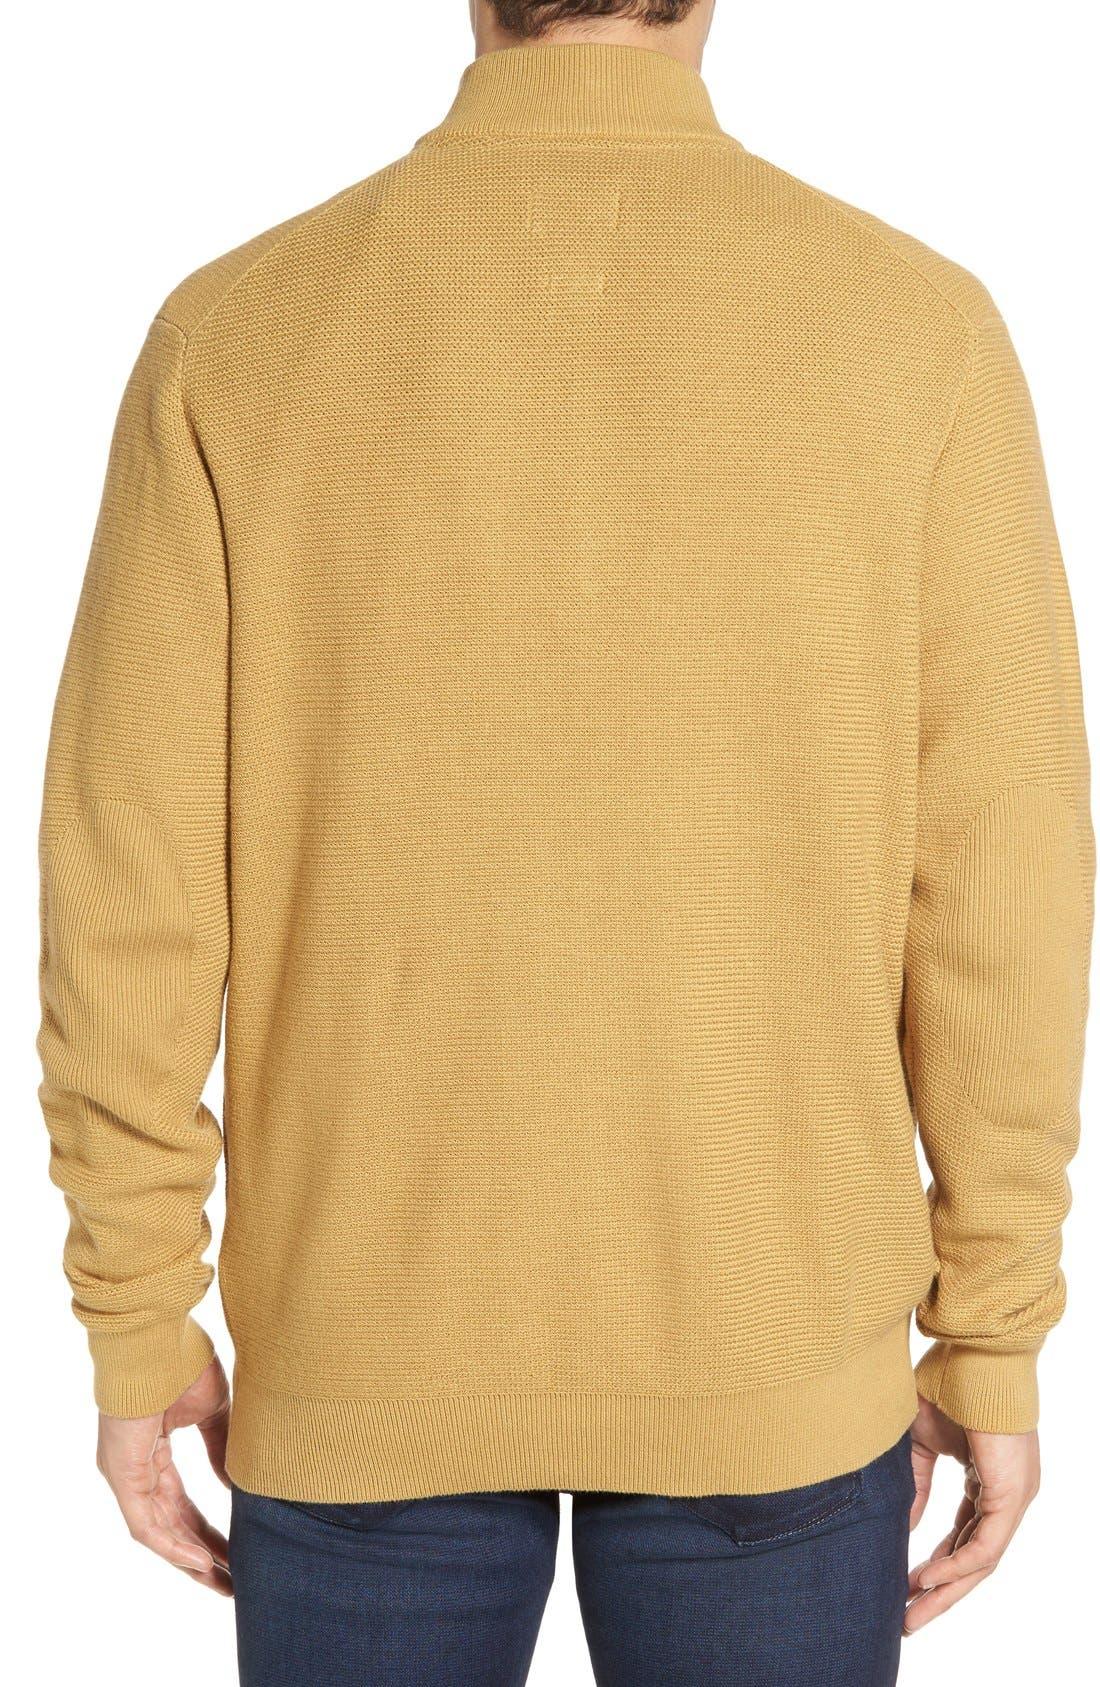 'Benson' Quarter Zip Textured Knit Sweater,                             Alternate thumbnail 12, color,